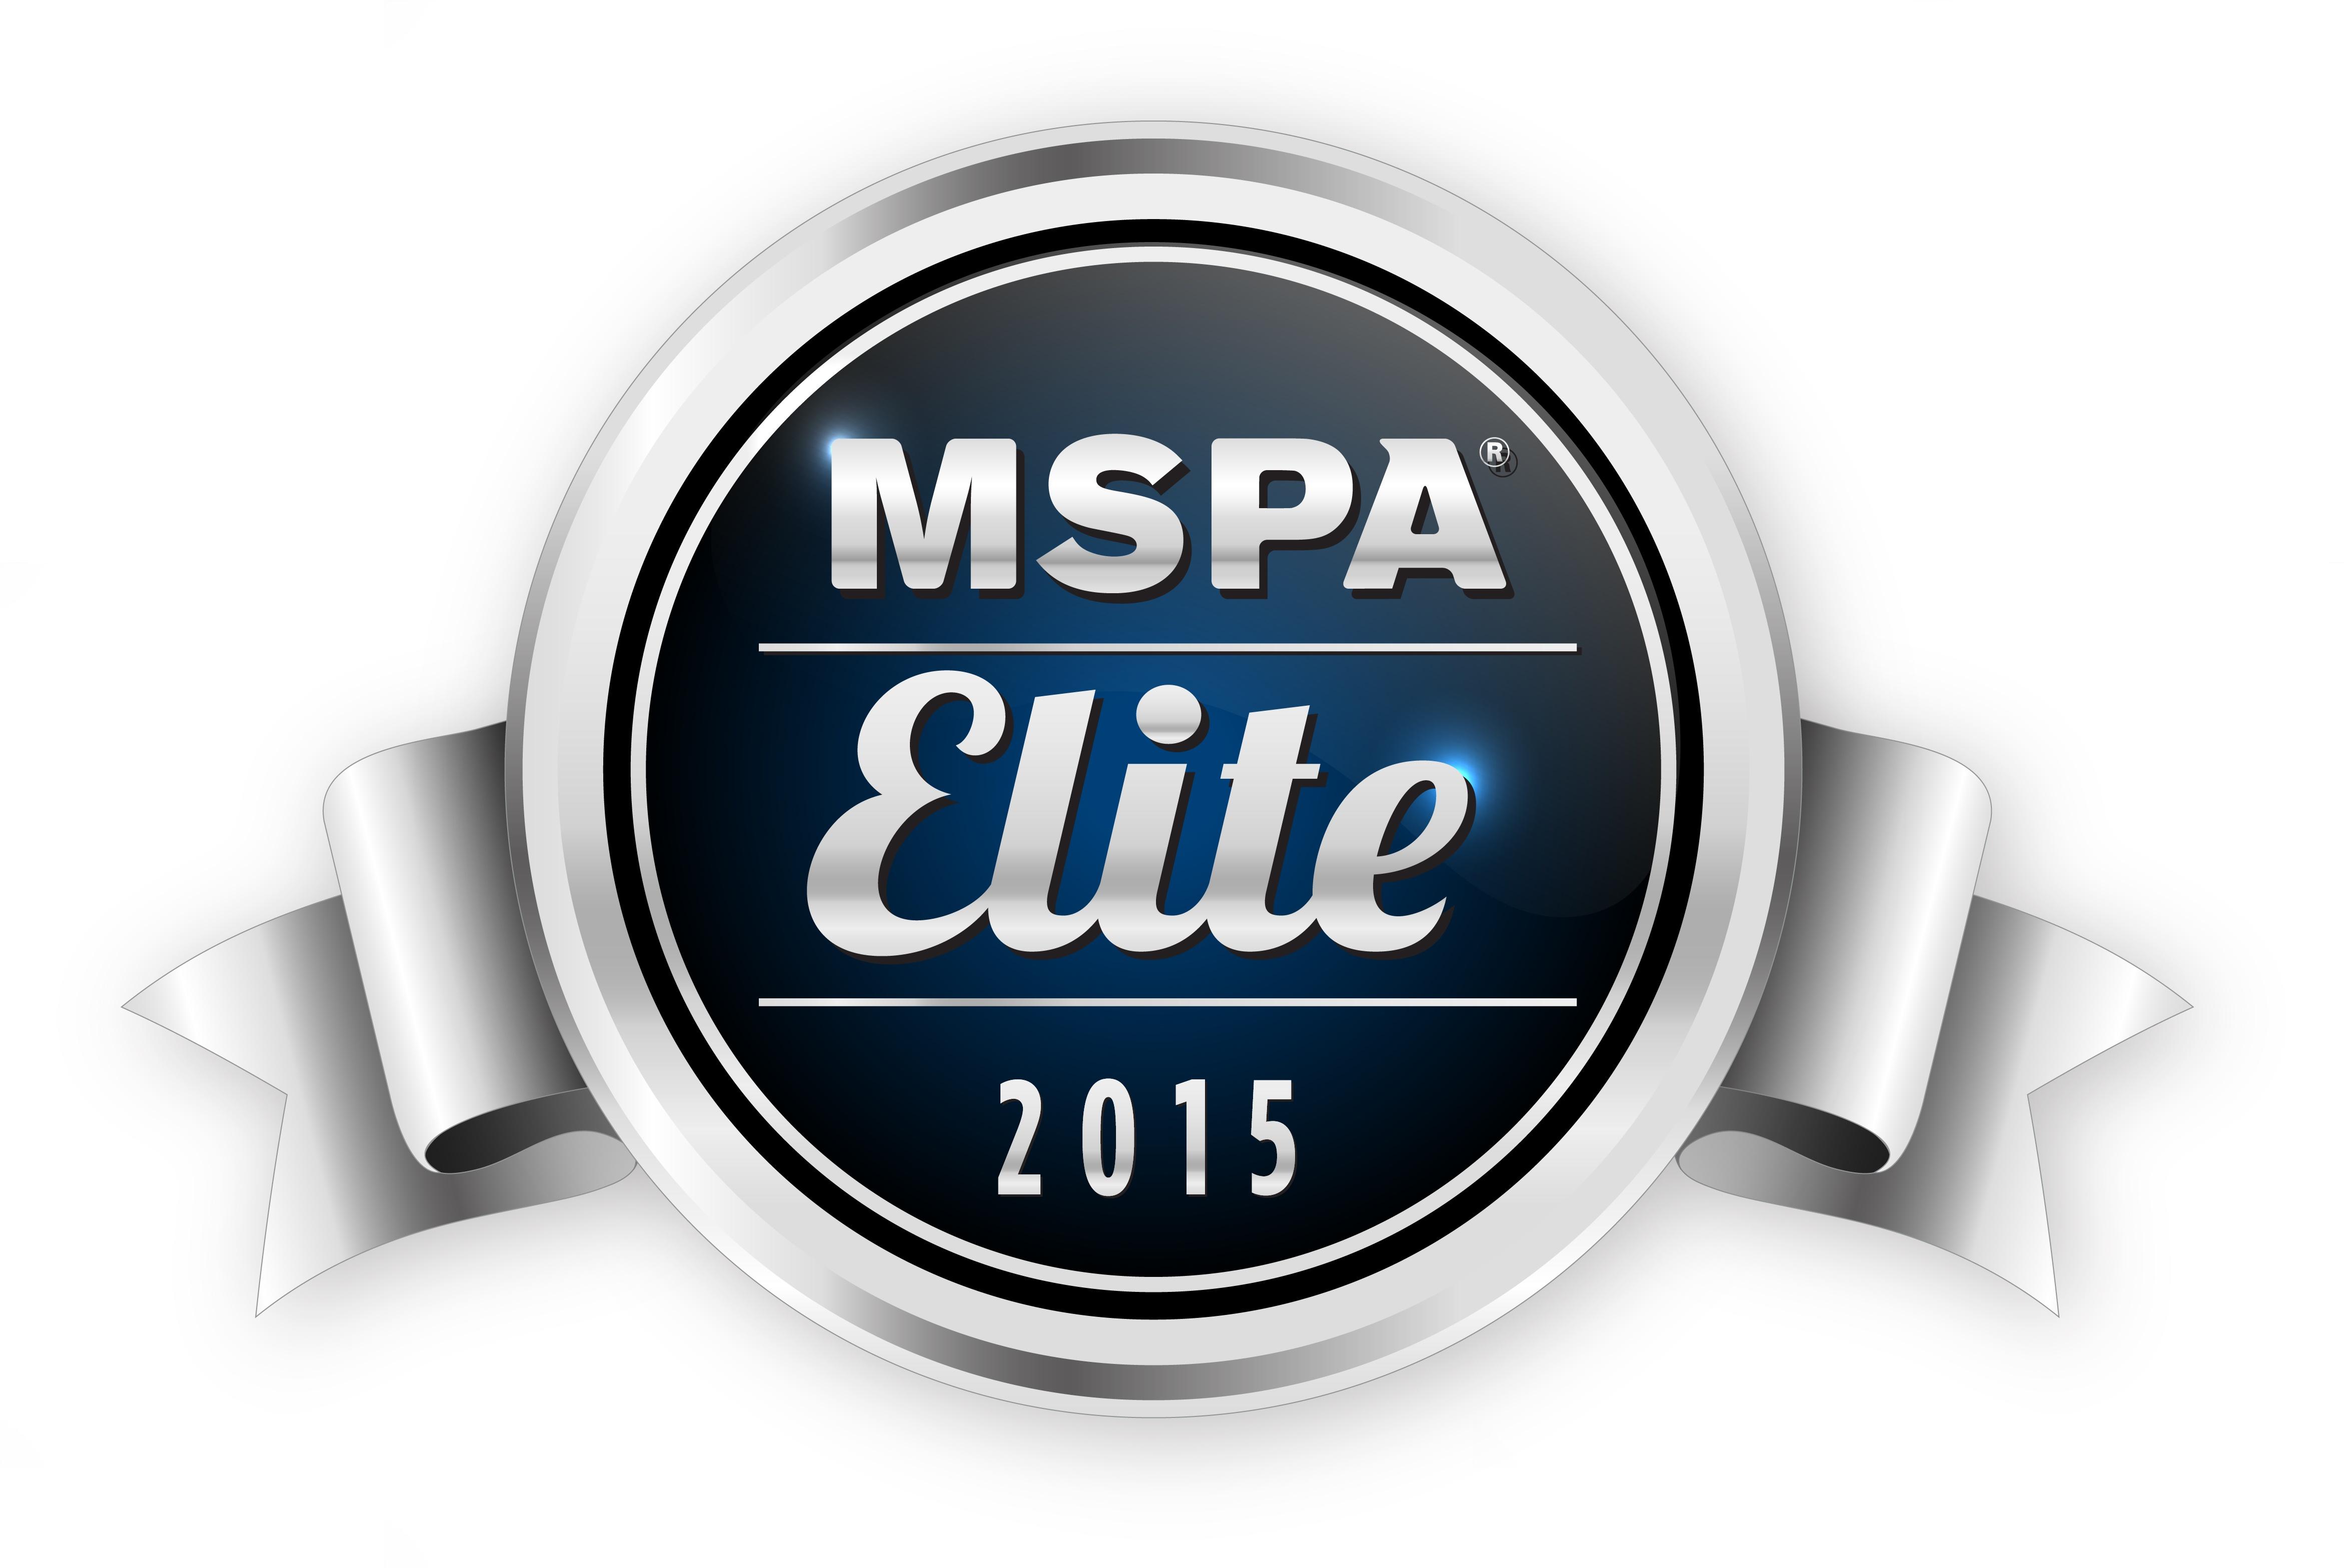 MSPA_Elite_2015